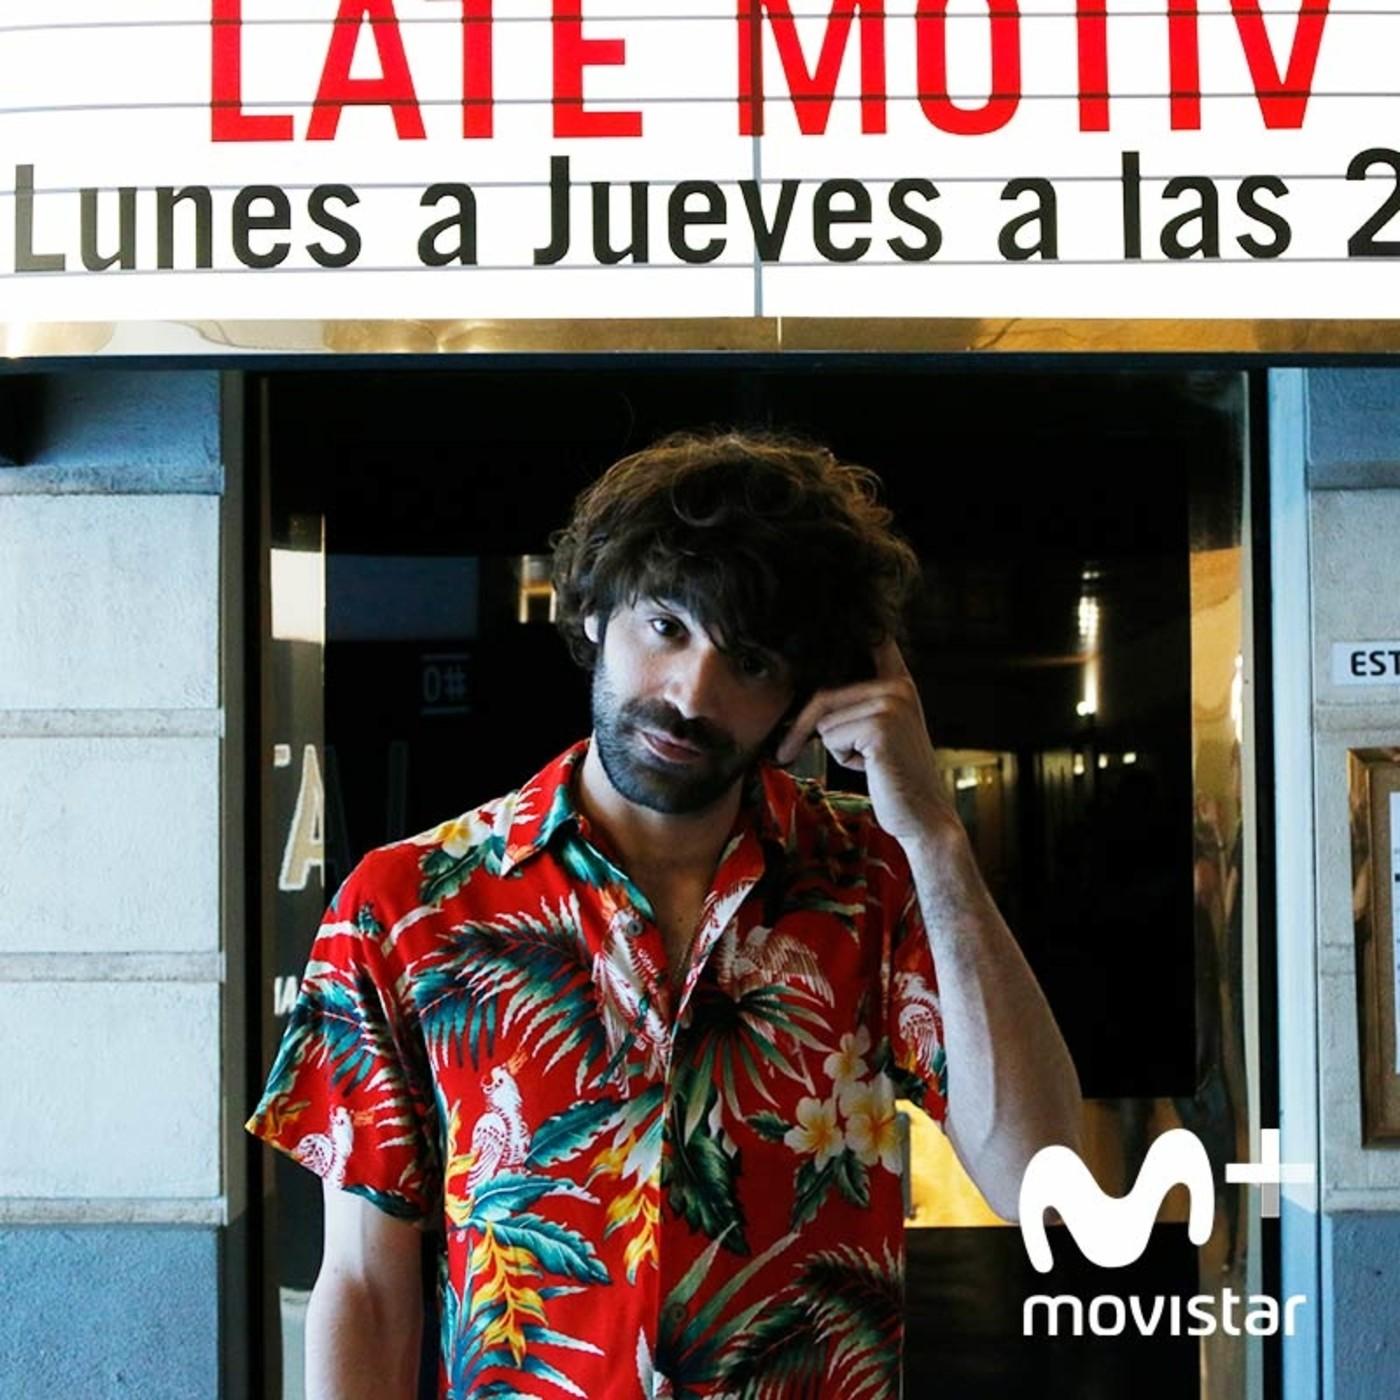 LATE MOTIV 574 - David Verdaguer